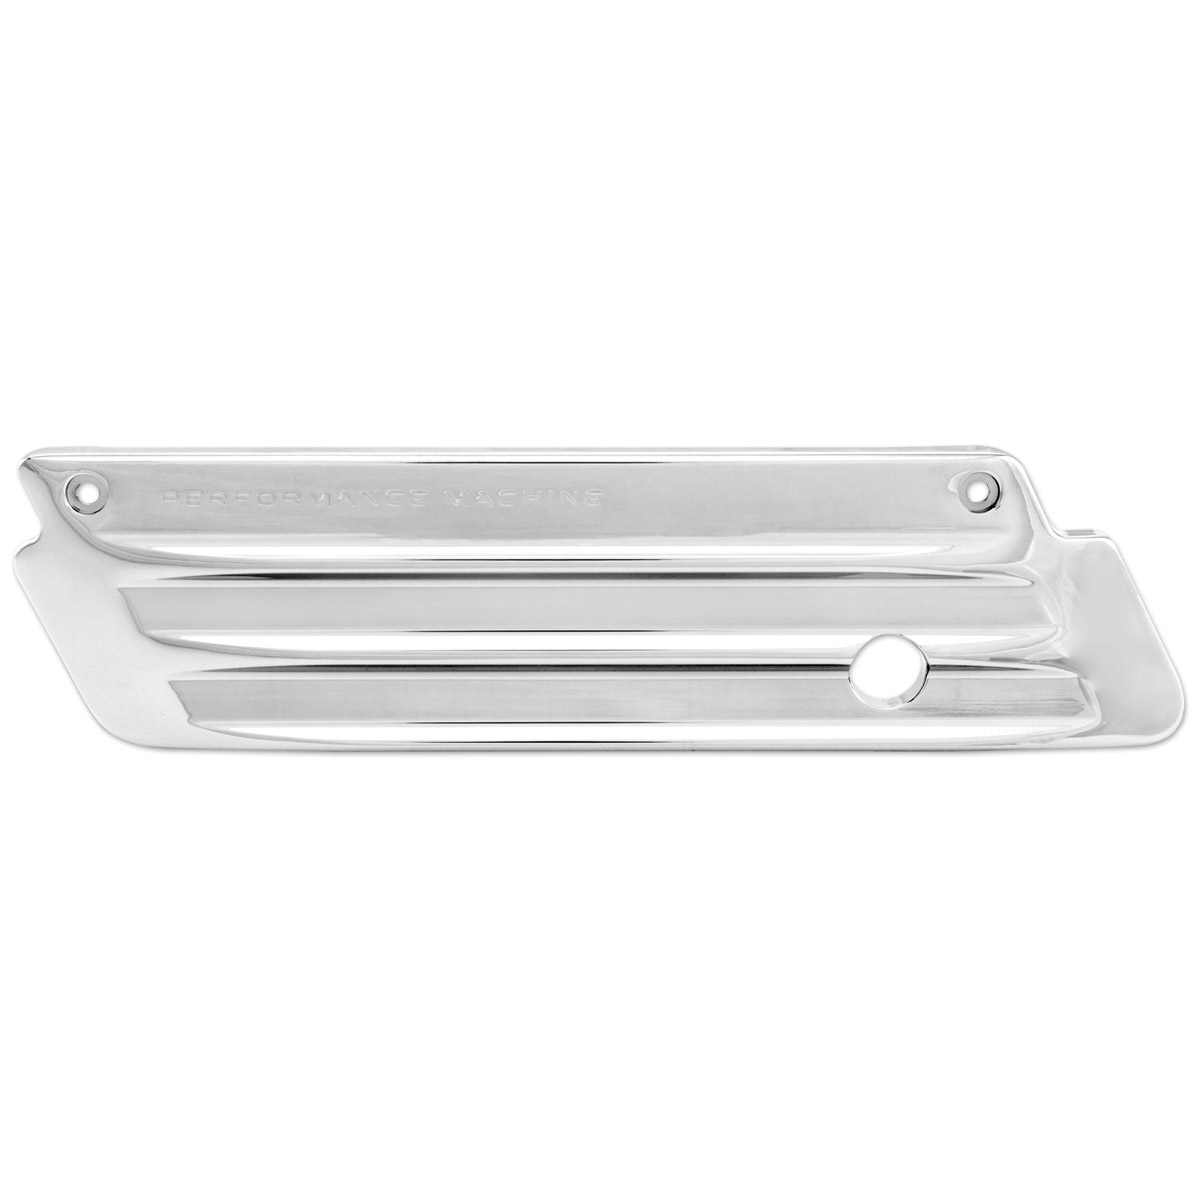 Performance Machine Chrome Drive Saddlebag Latch Cover